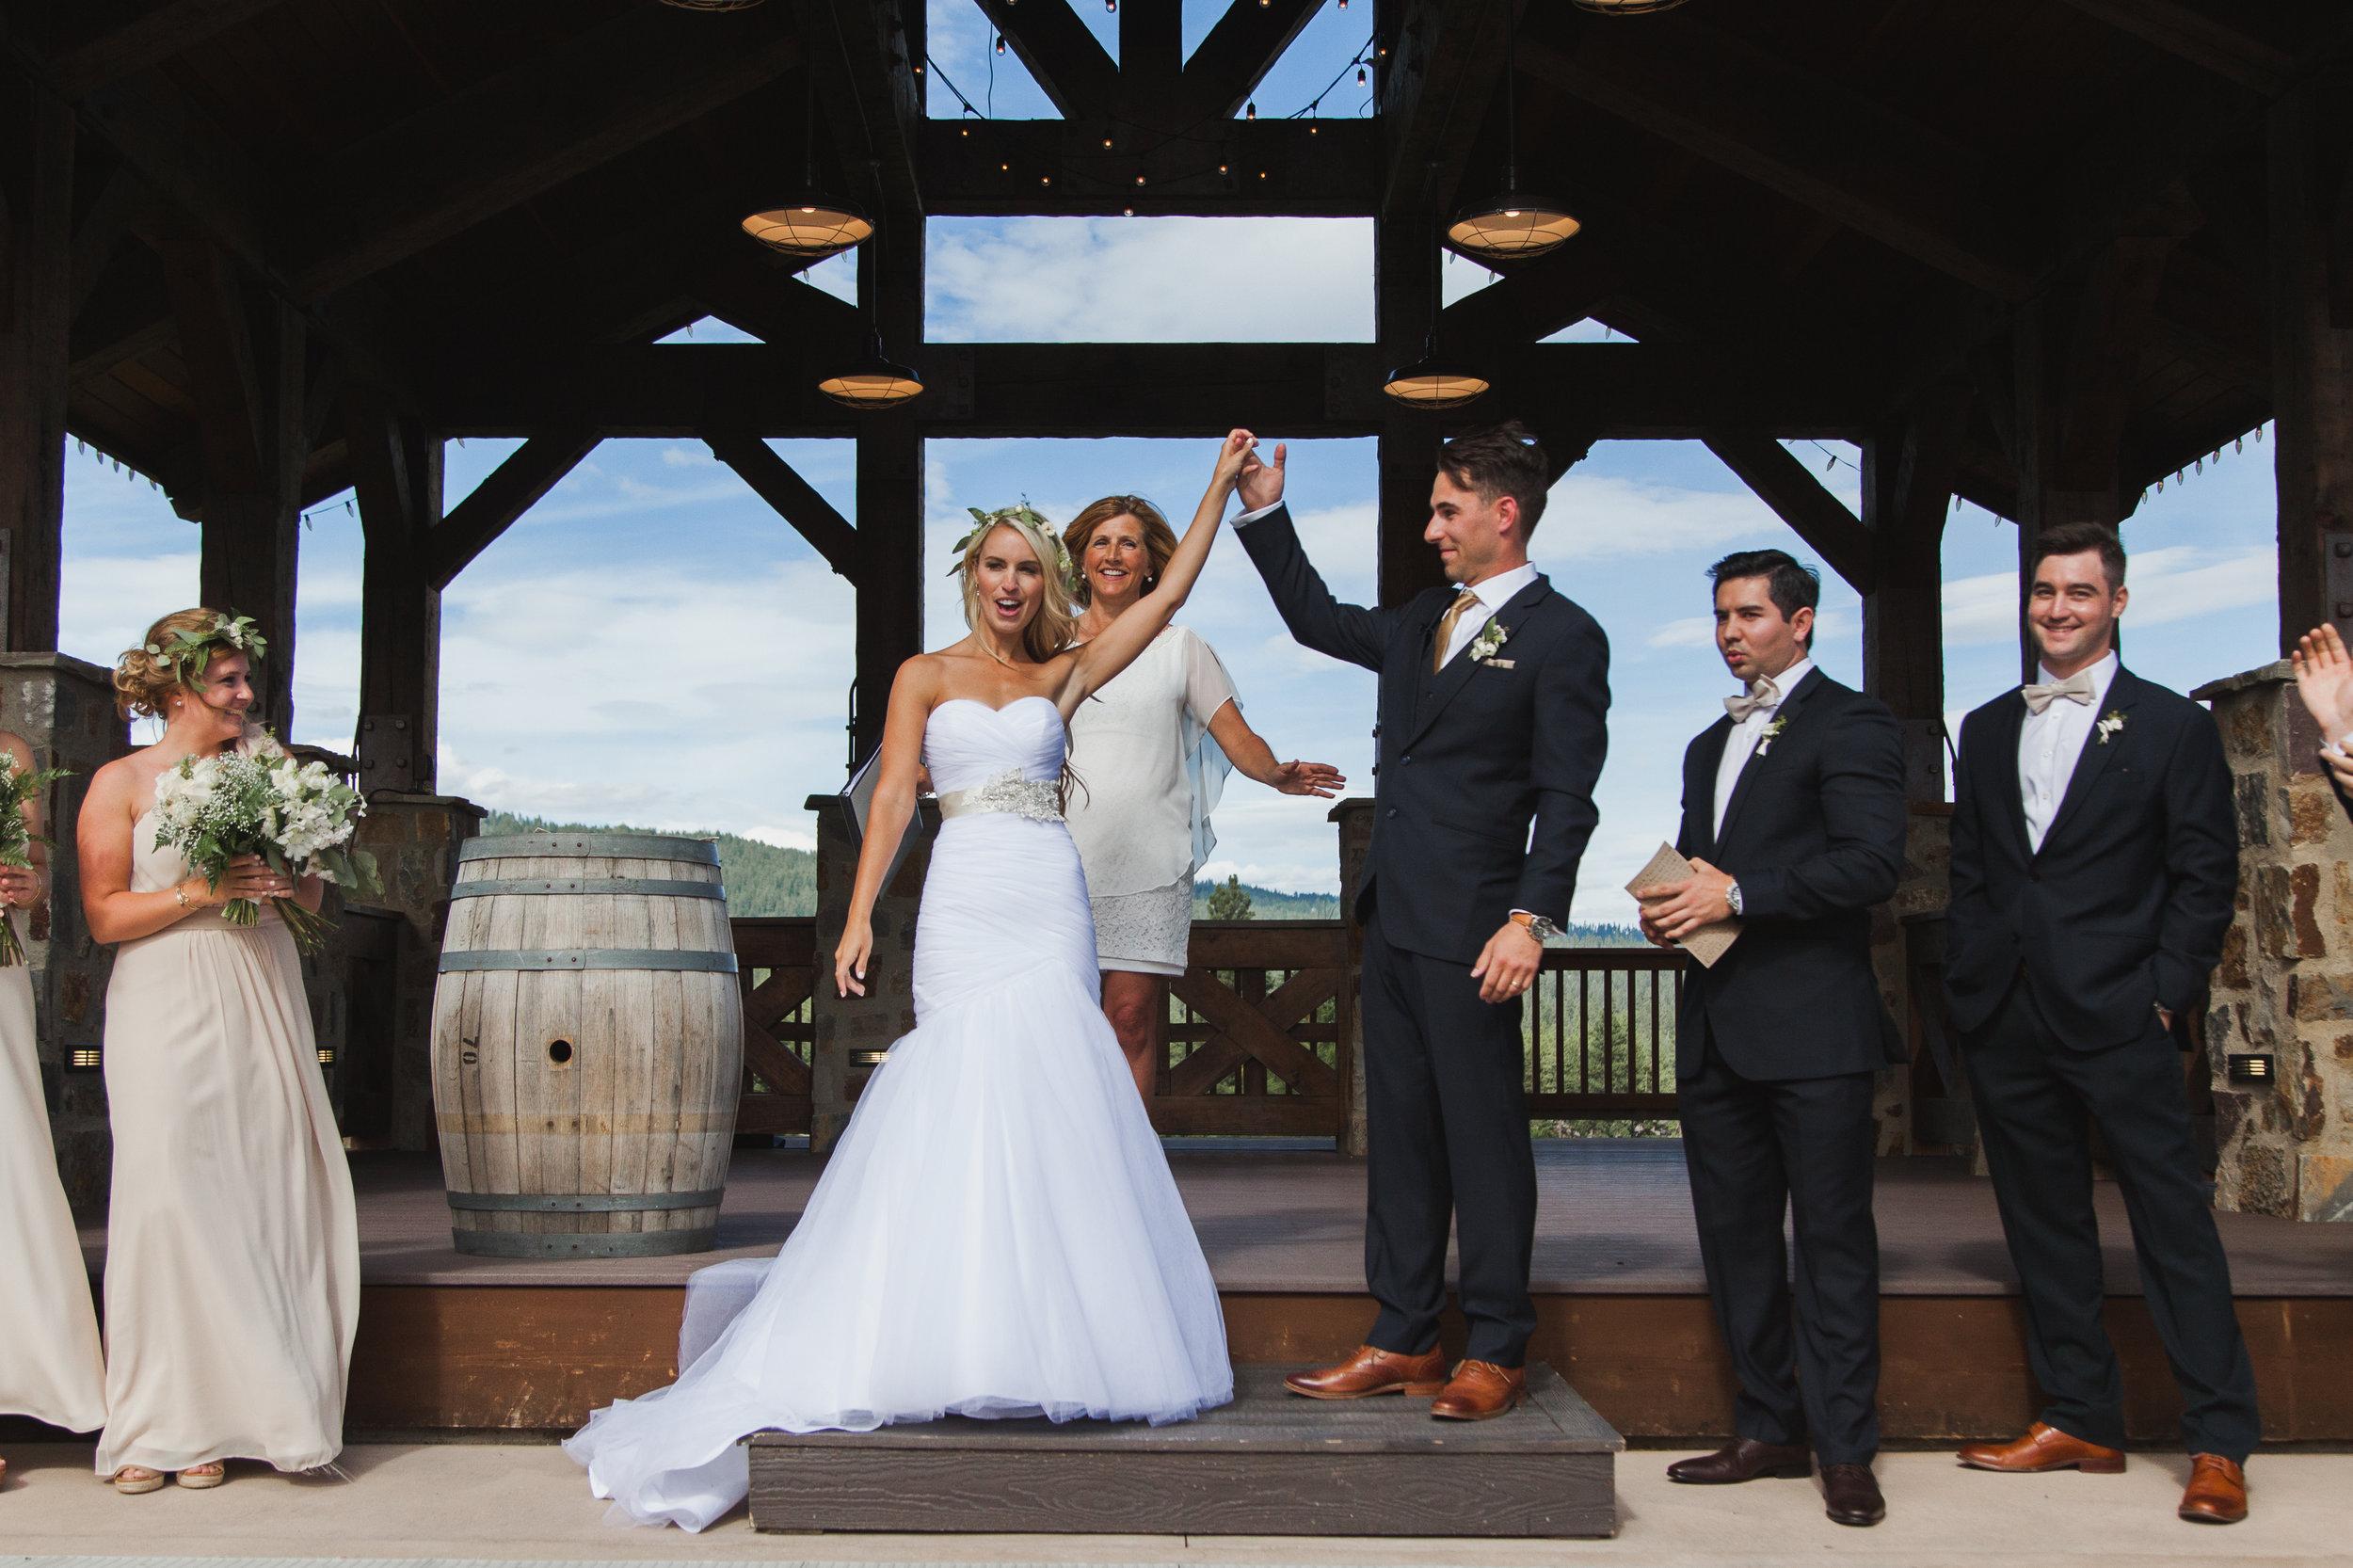 WEYER-WEDDING-DANCING-36.jpg